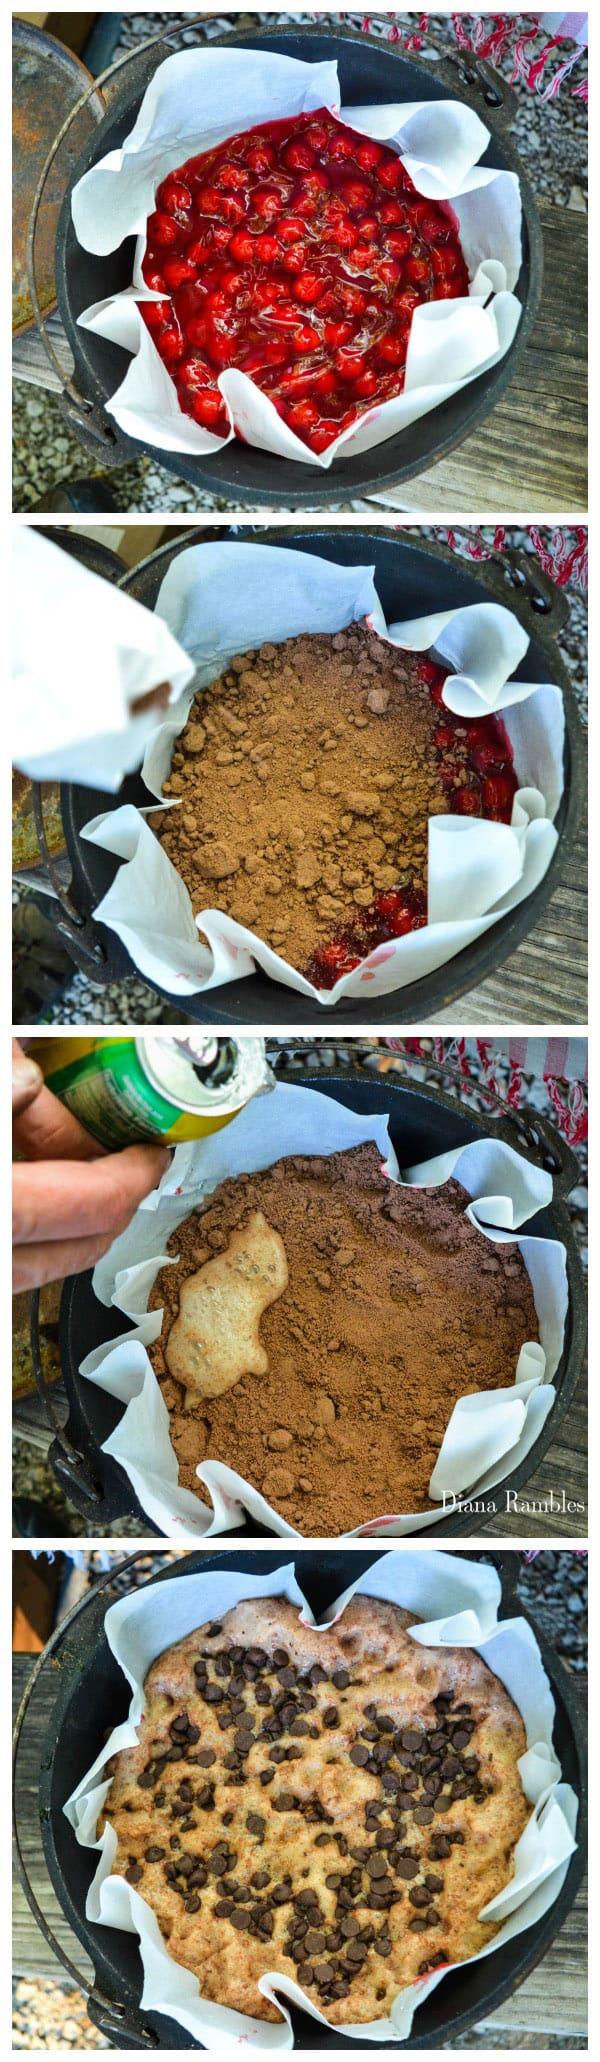 Chocolate Cherry Lava Cake Recipe Directions